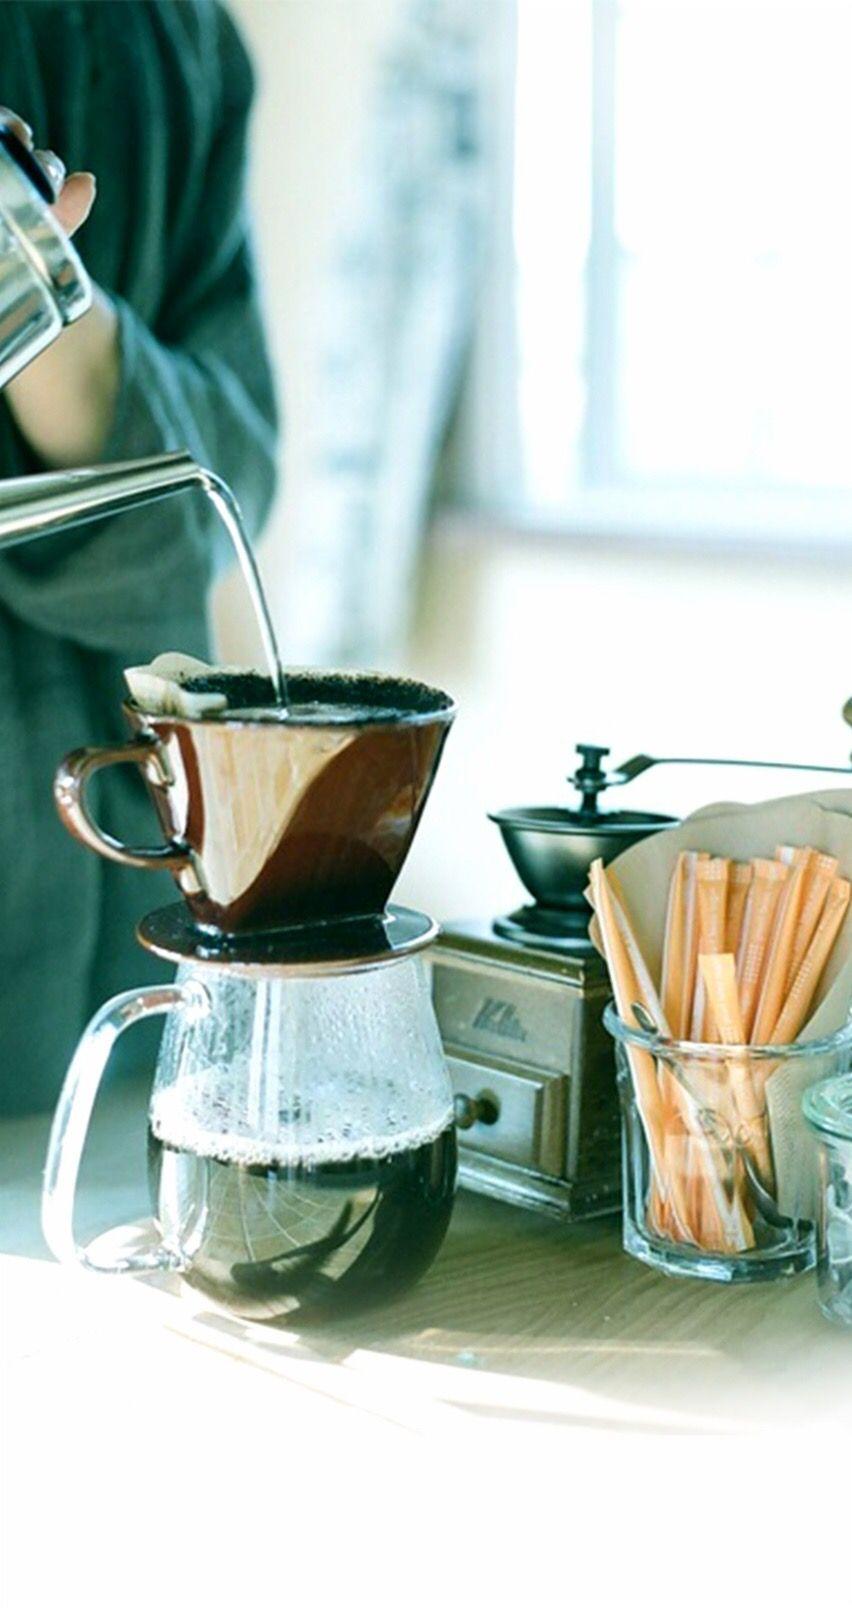 Drip Coffee Coffee, Drip coffee, V60 coffee